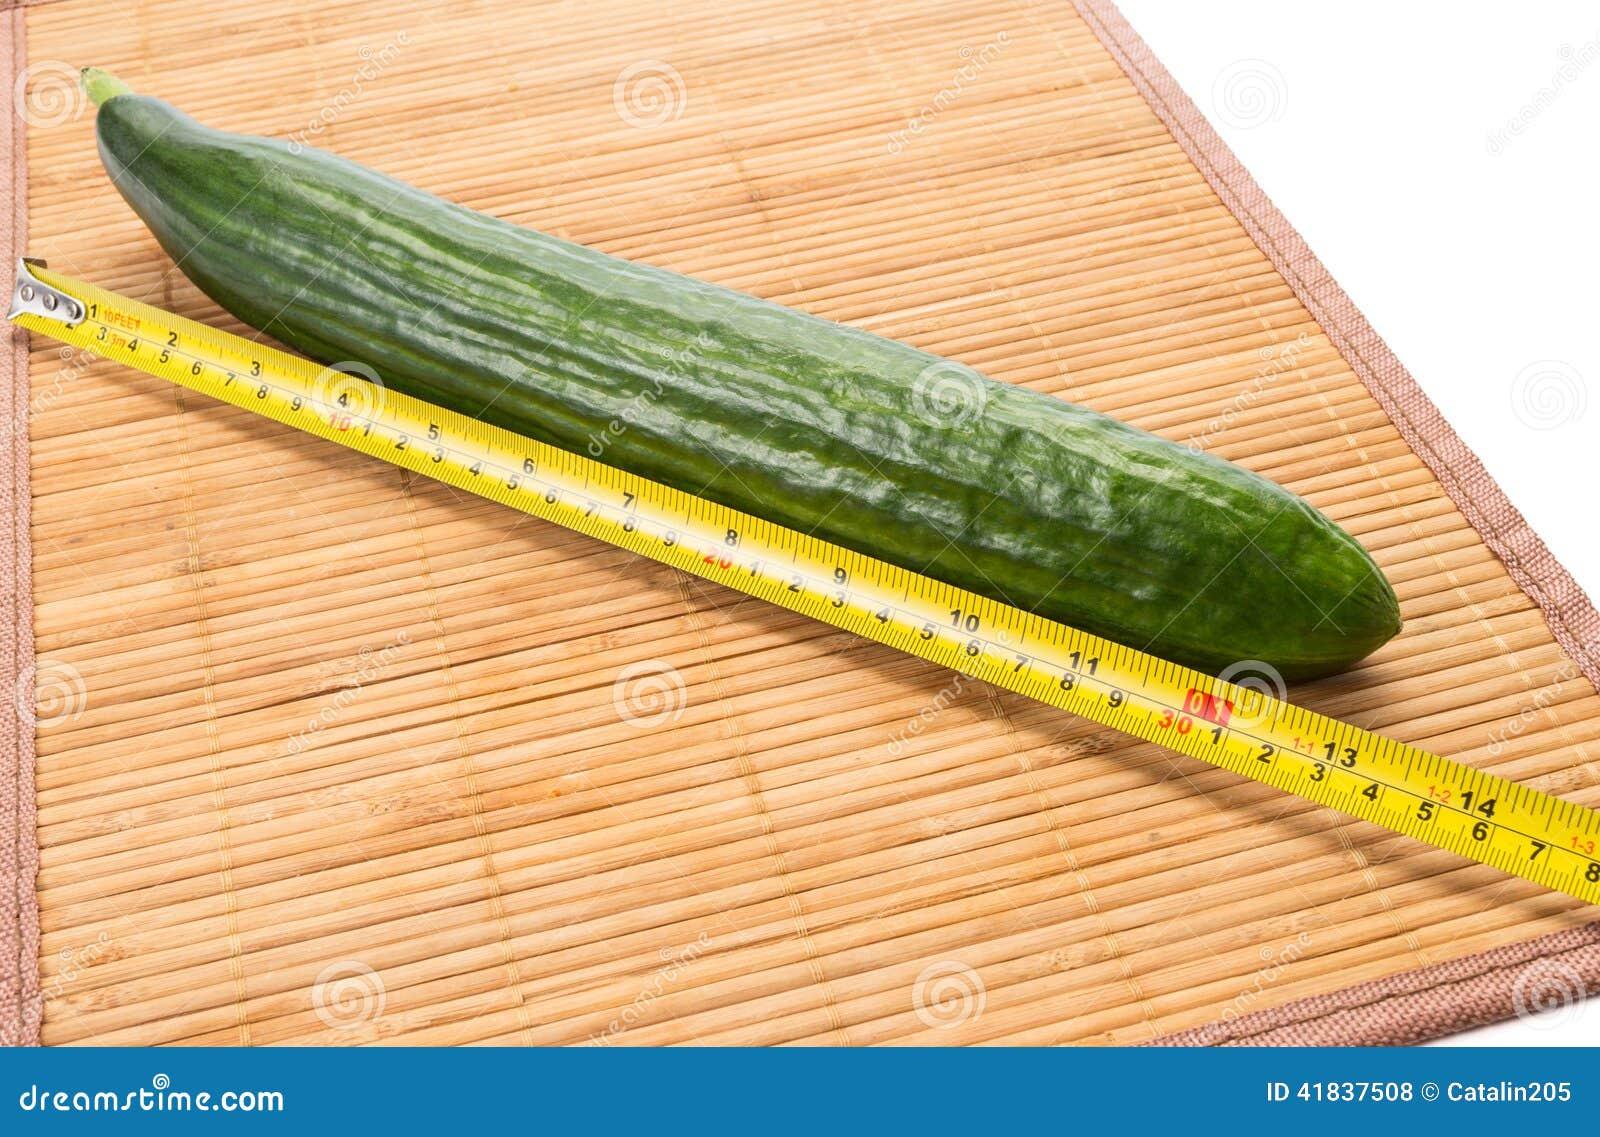 Big yellow centimeter and big green cucumber